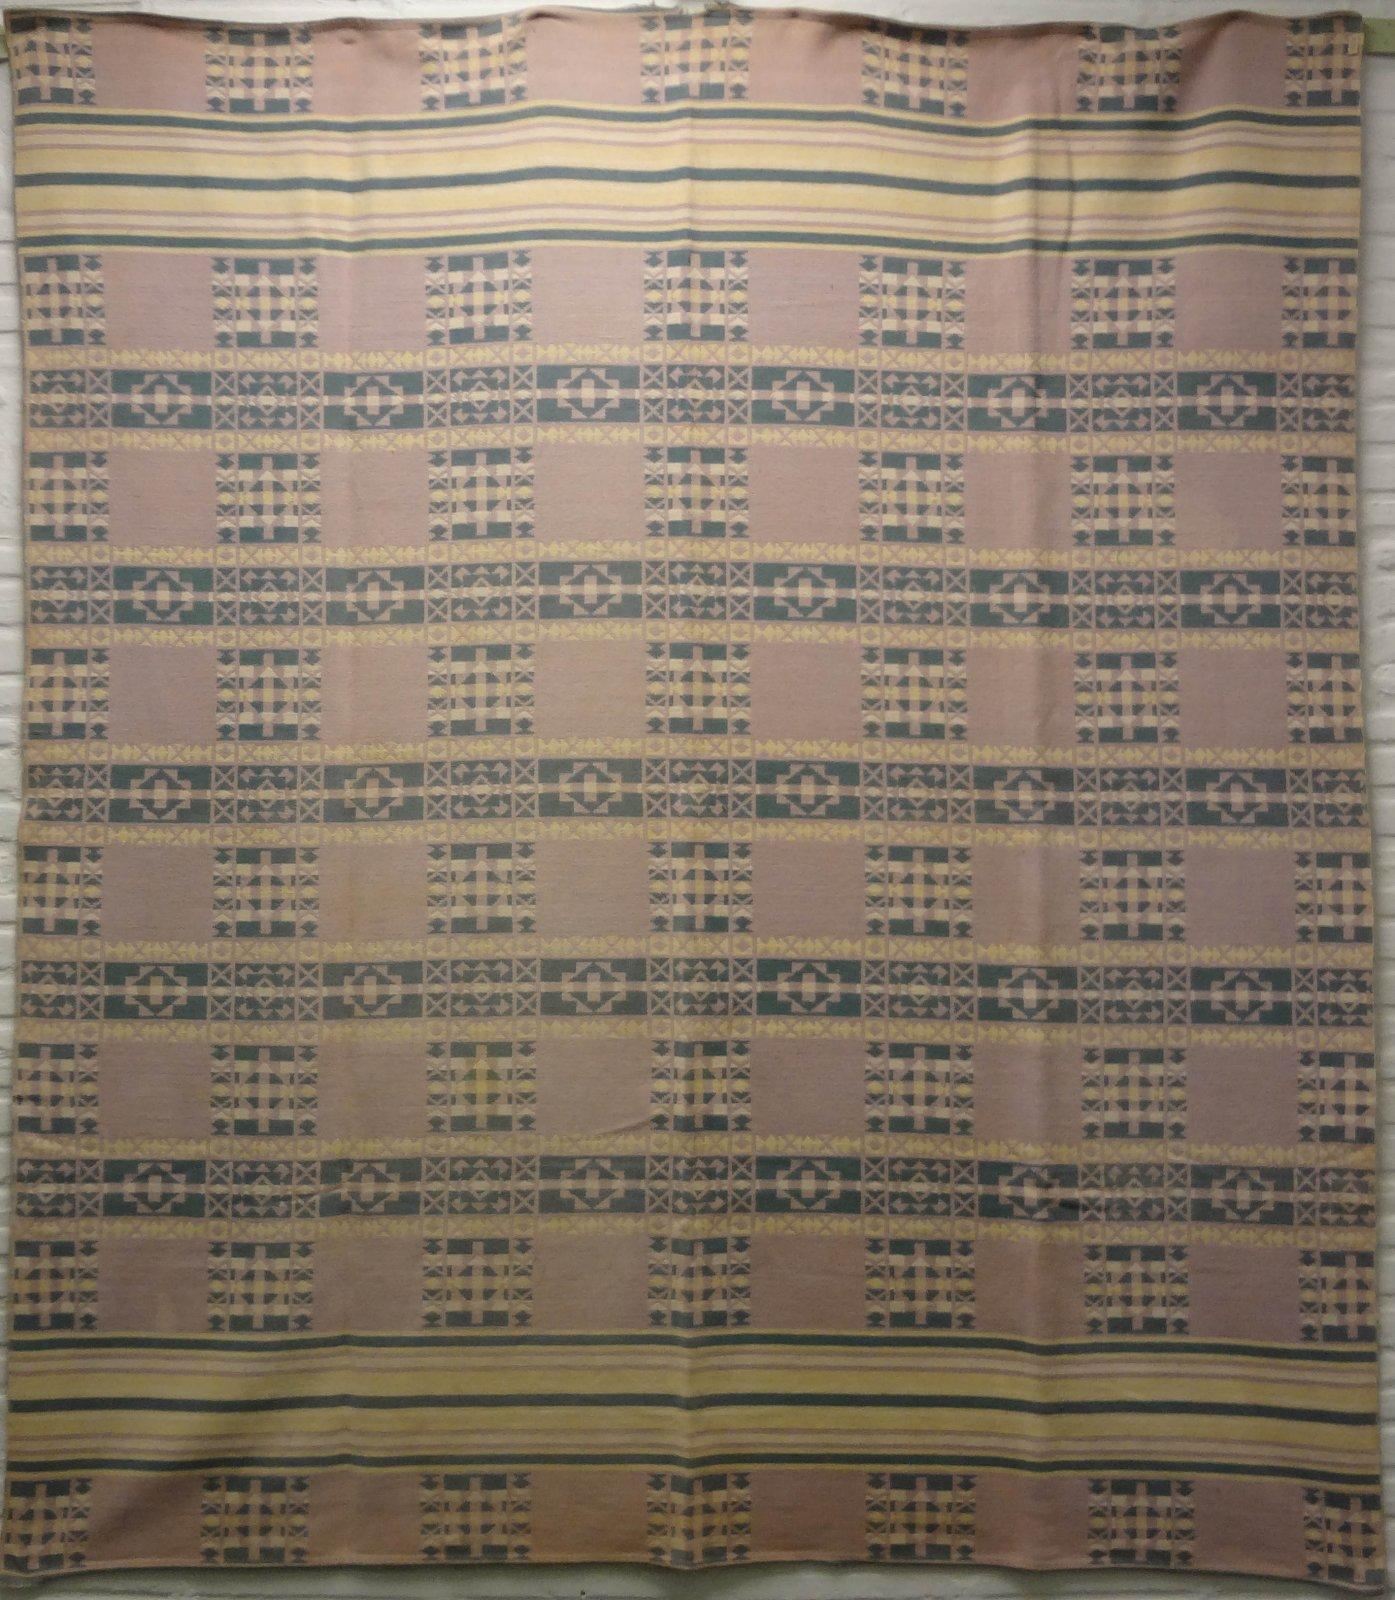 BEACON VINTAGE BLANKET narrow figured stripes pale colors